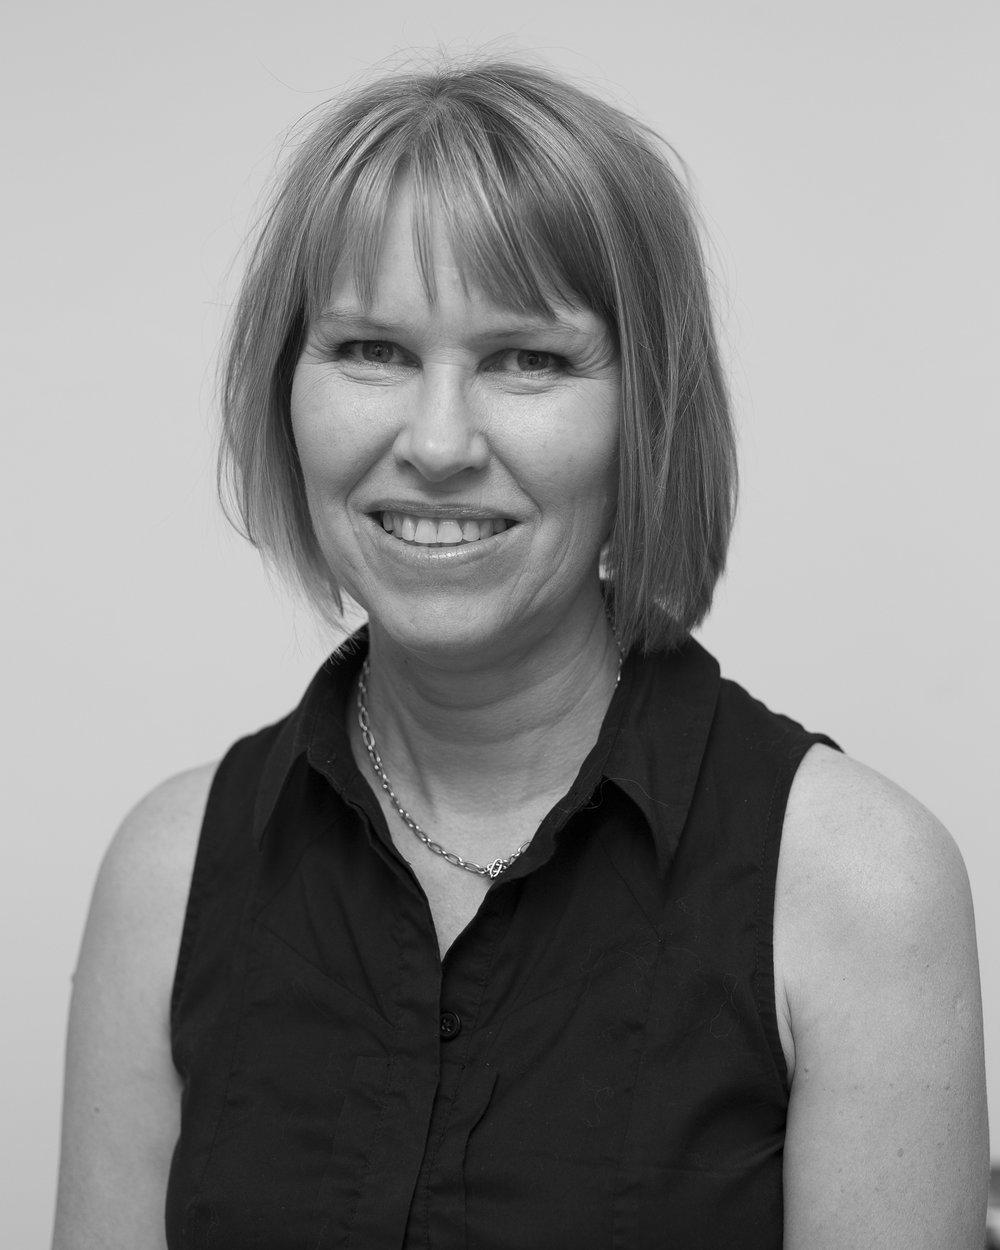 Donna Lambie